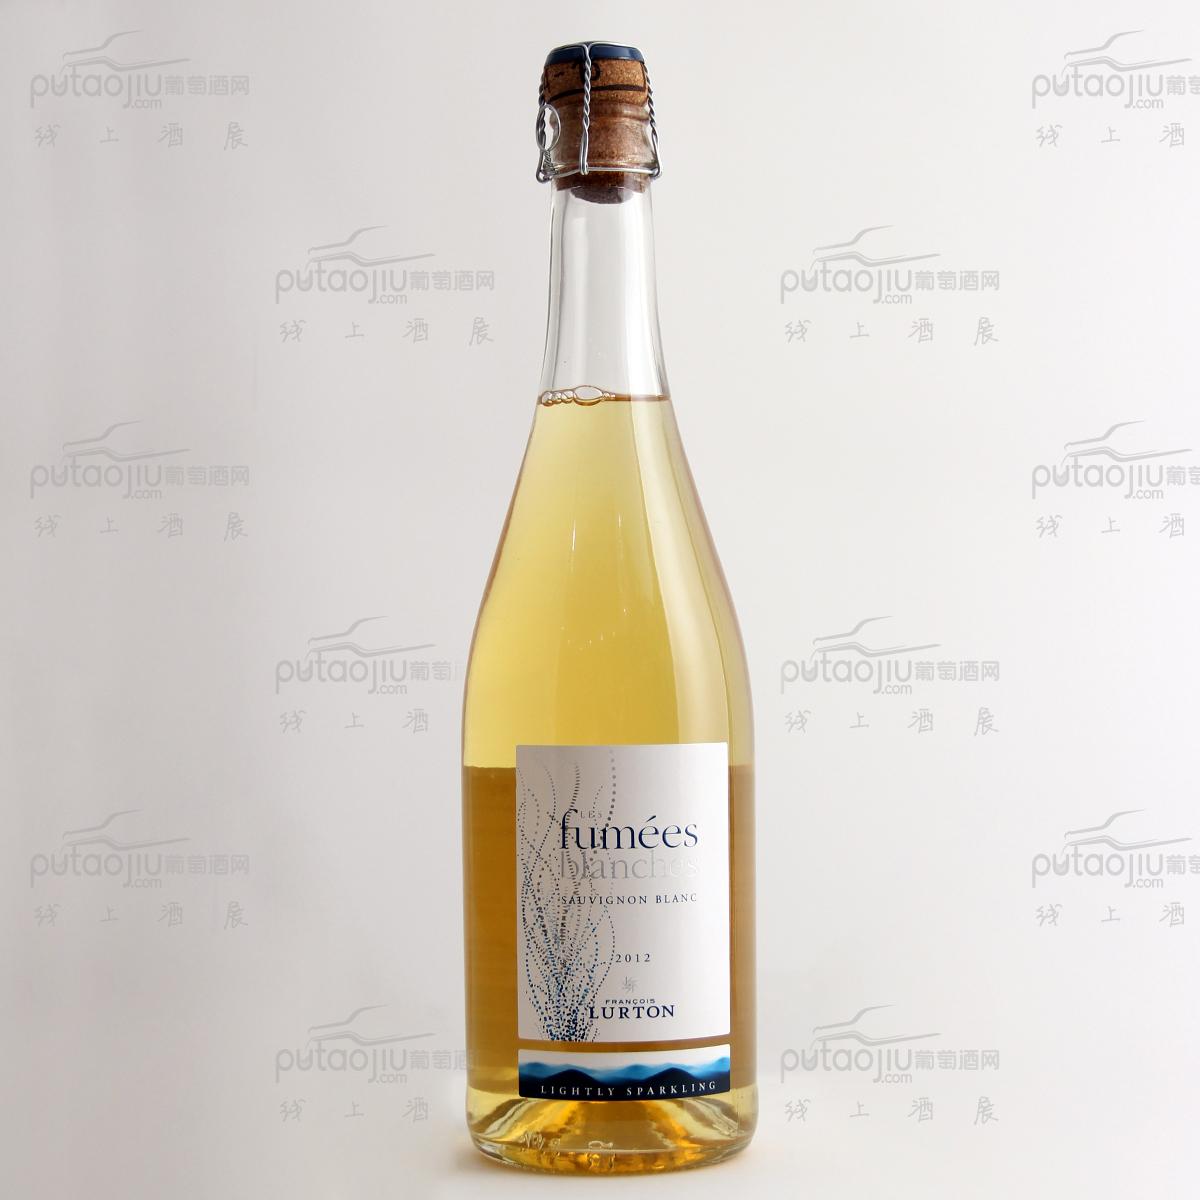 法国波尔多Francois Lurrton SA Domaine de酒庄长相思馥美IGP起泡酒